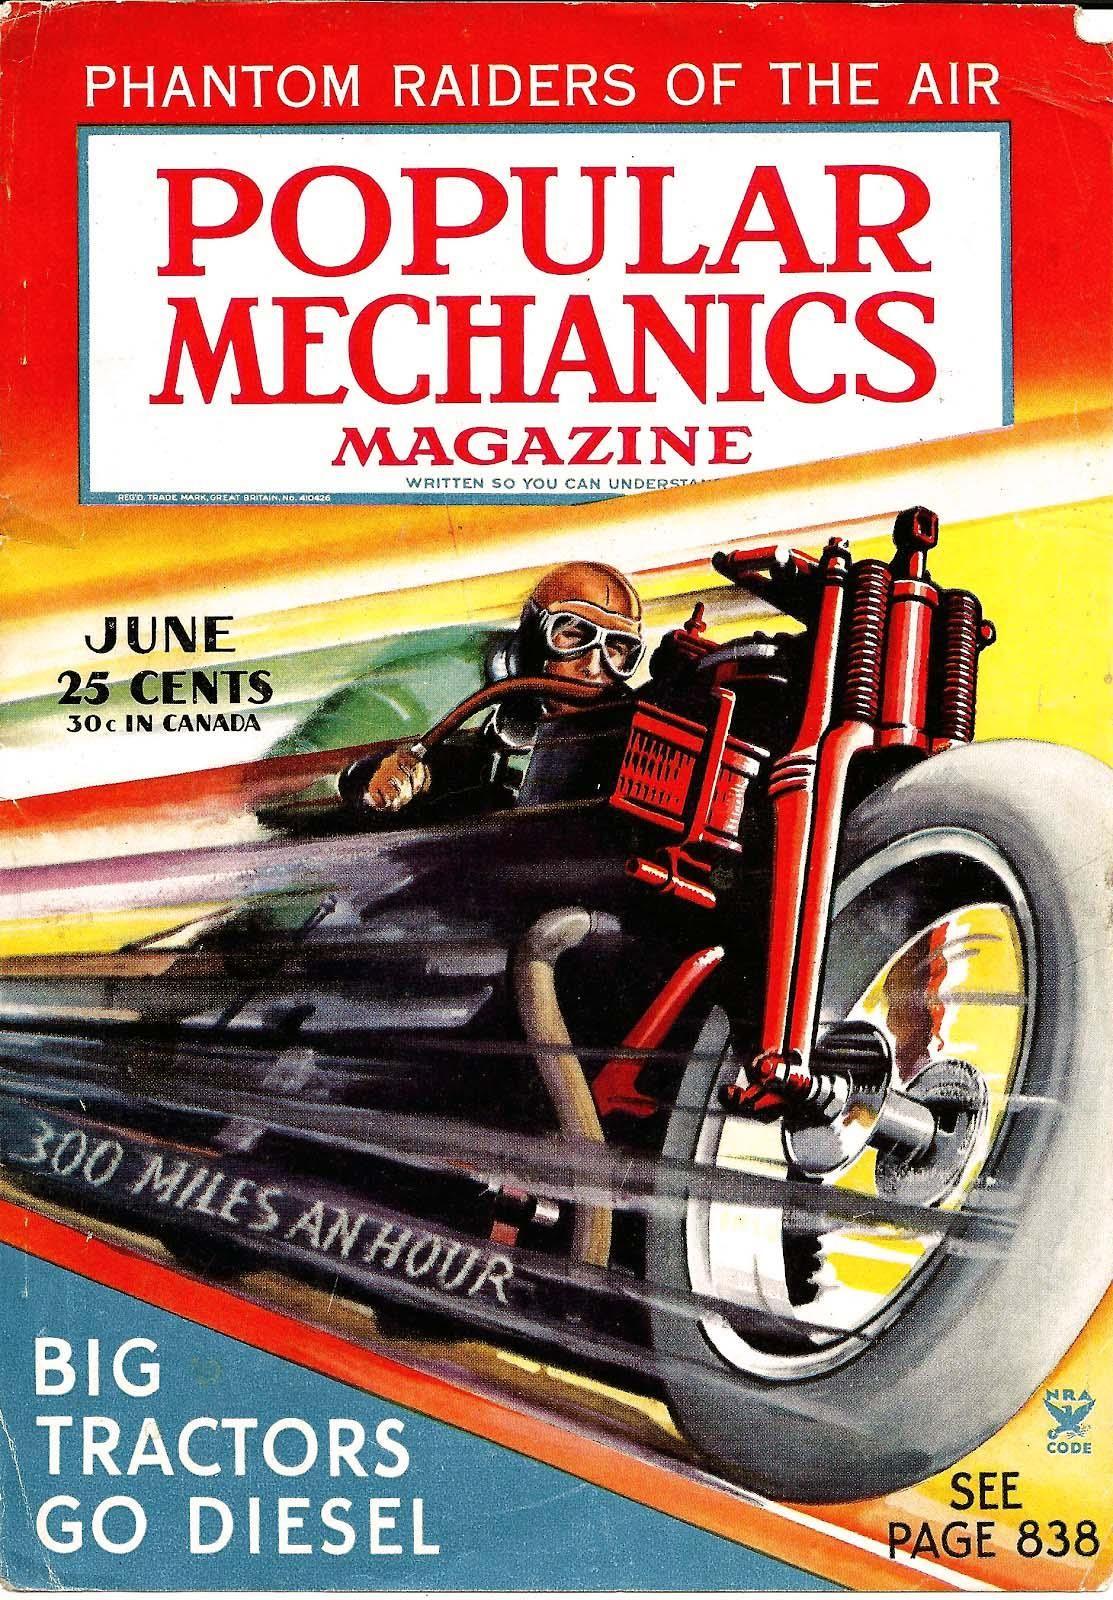 Popular mechanics | Sci-Fi retro futurist magazine cover